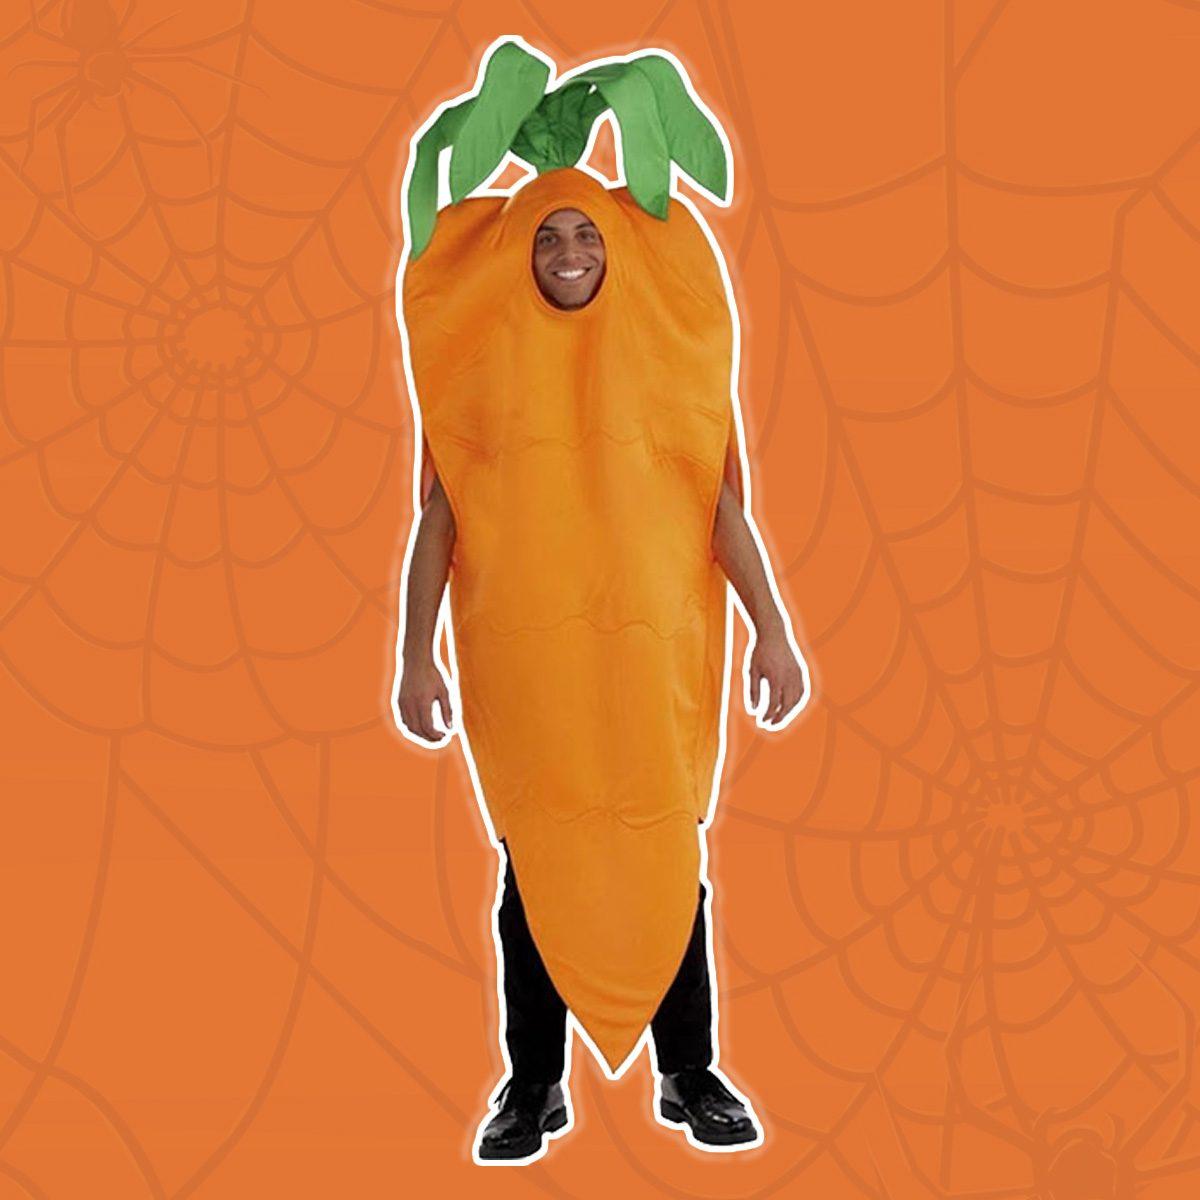 Carrot man